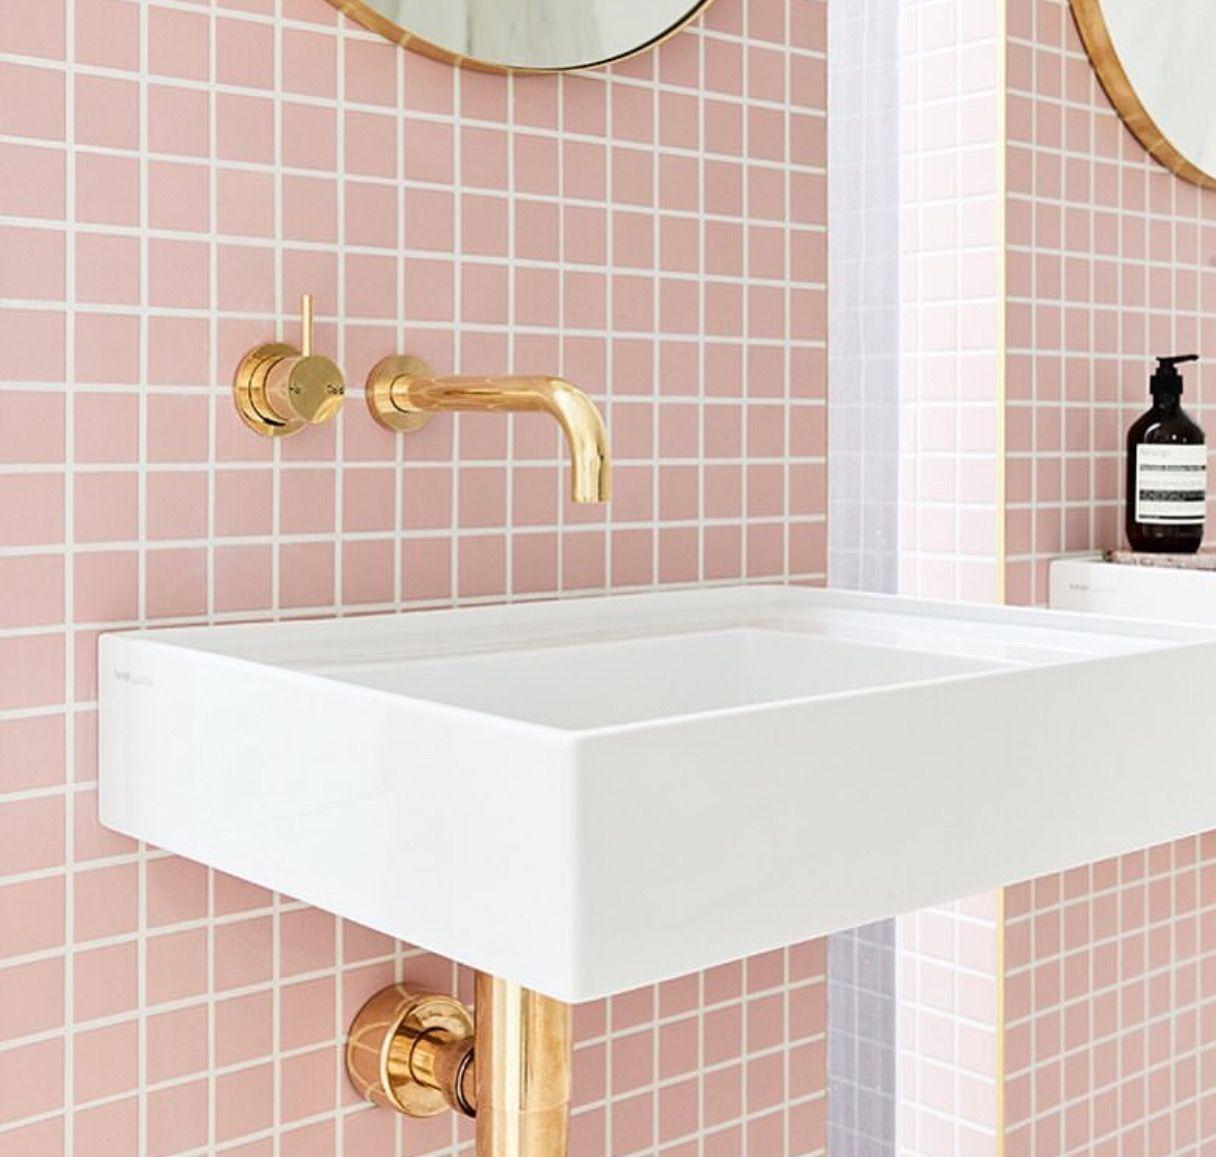 pink bath | BATH | Pinterest | Pink baths, Bath and Gold taps